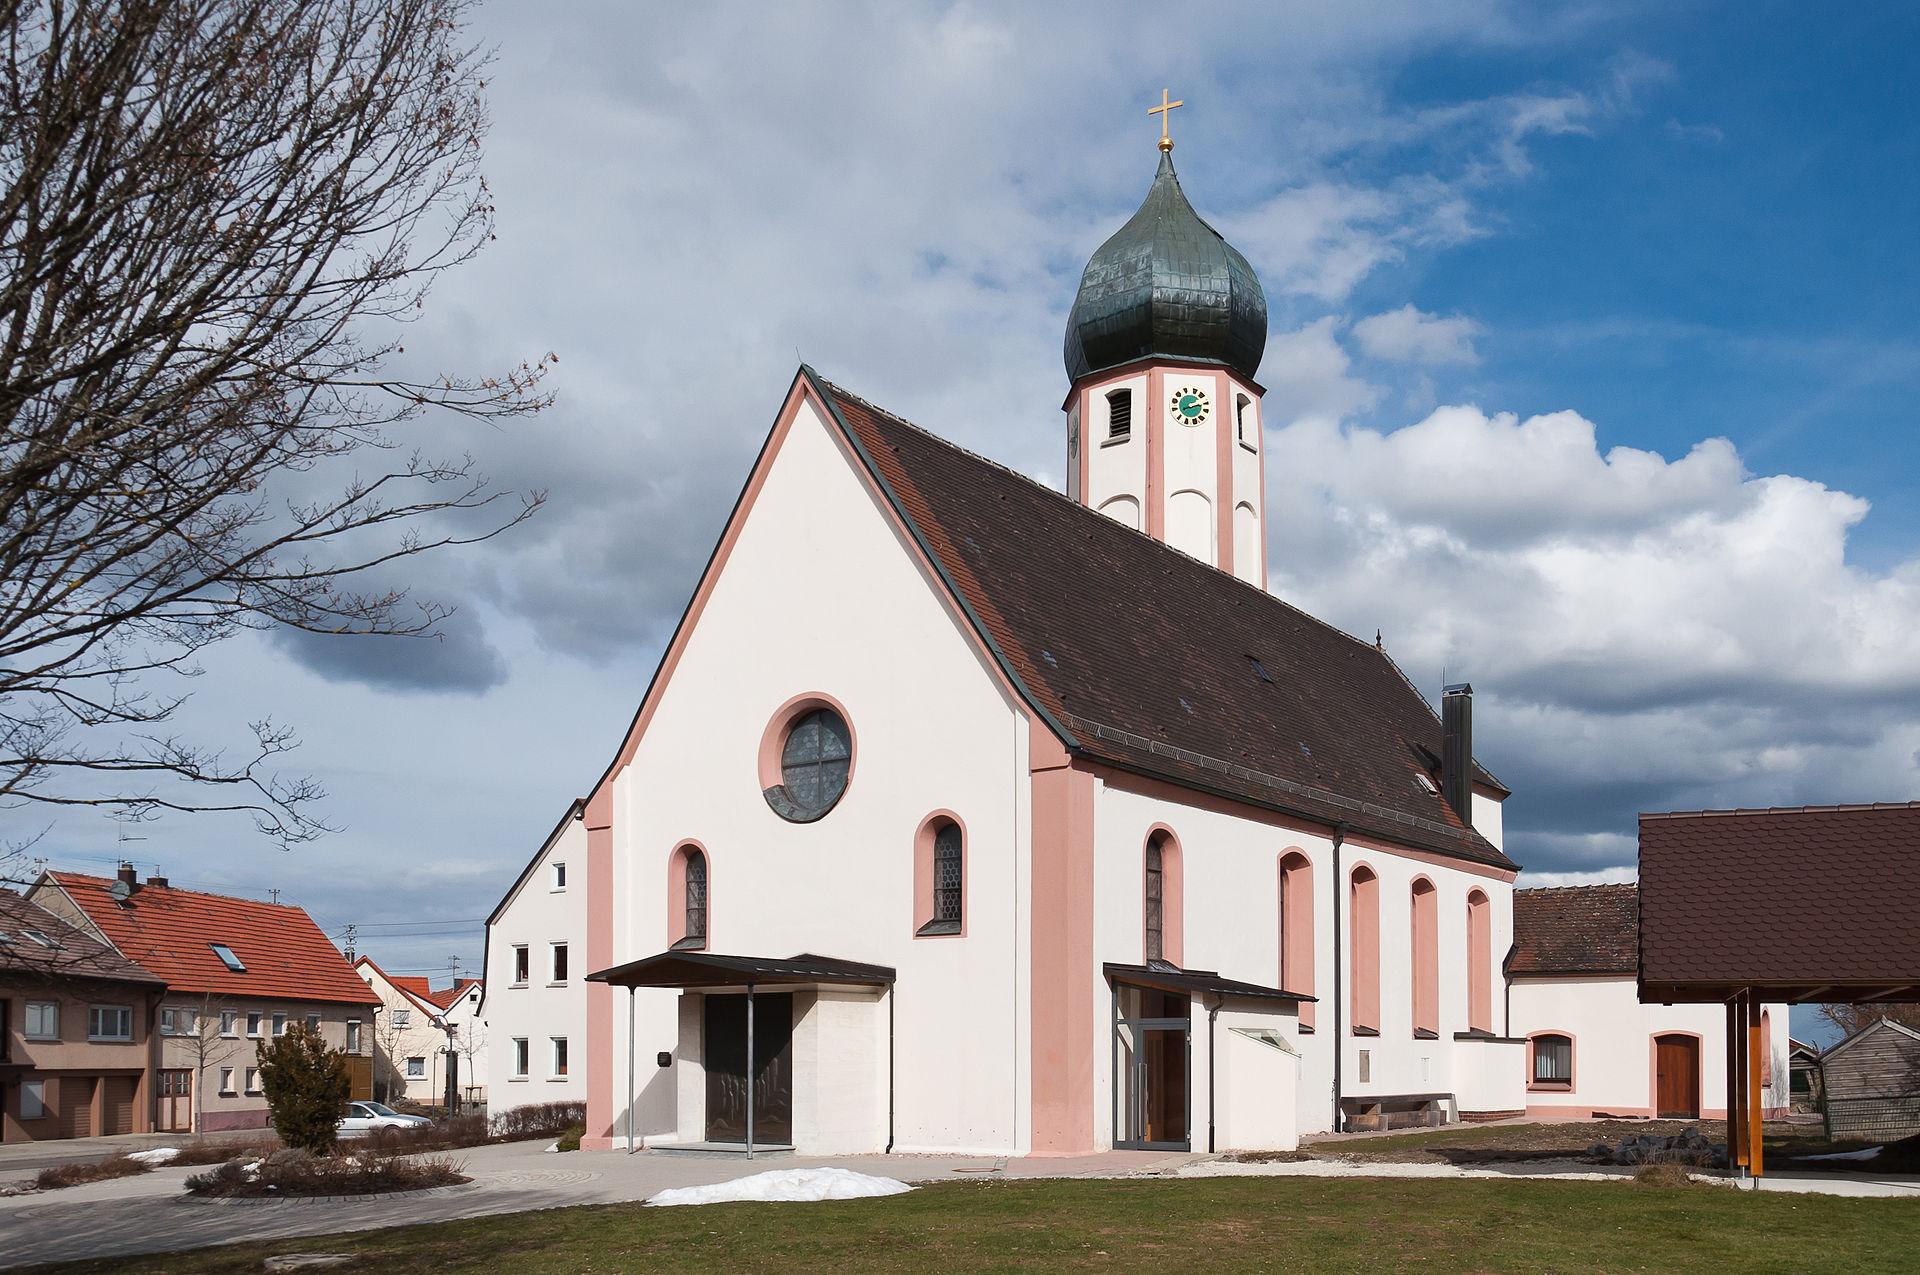 Pfarrkirche Frohnstetten